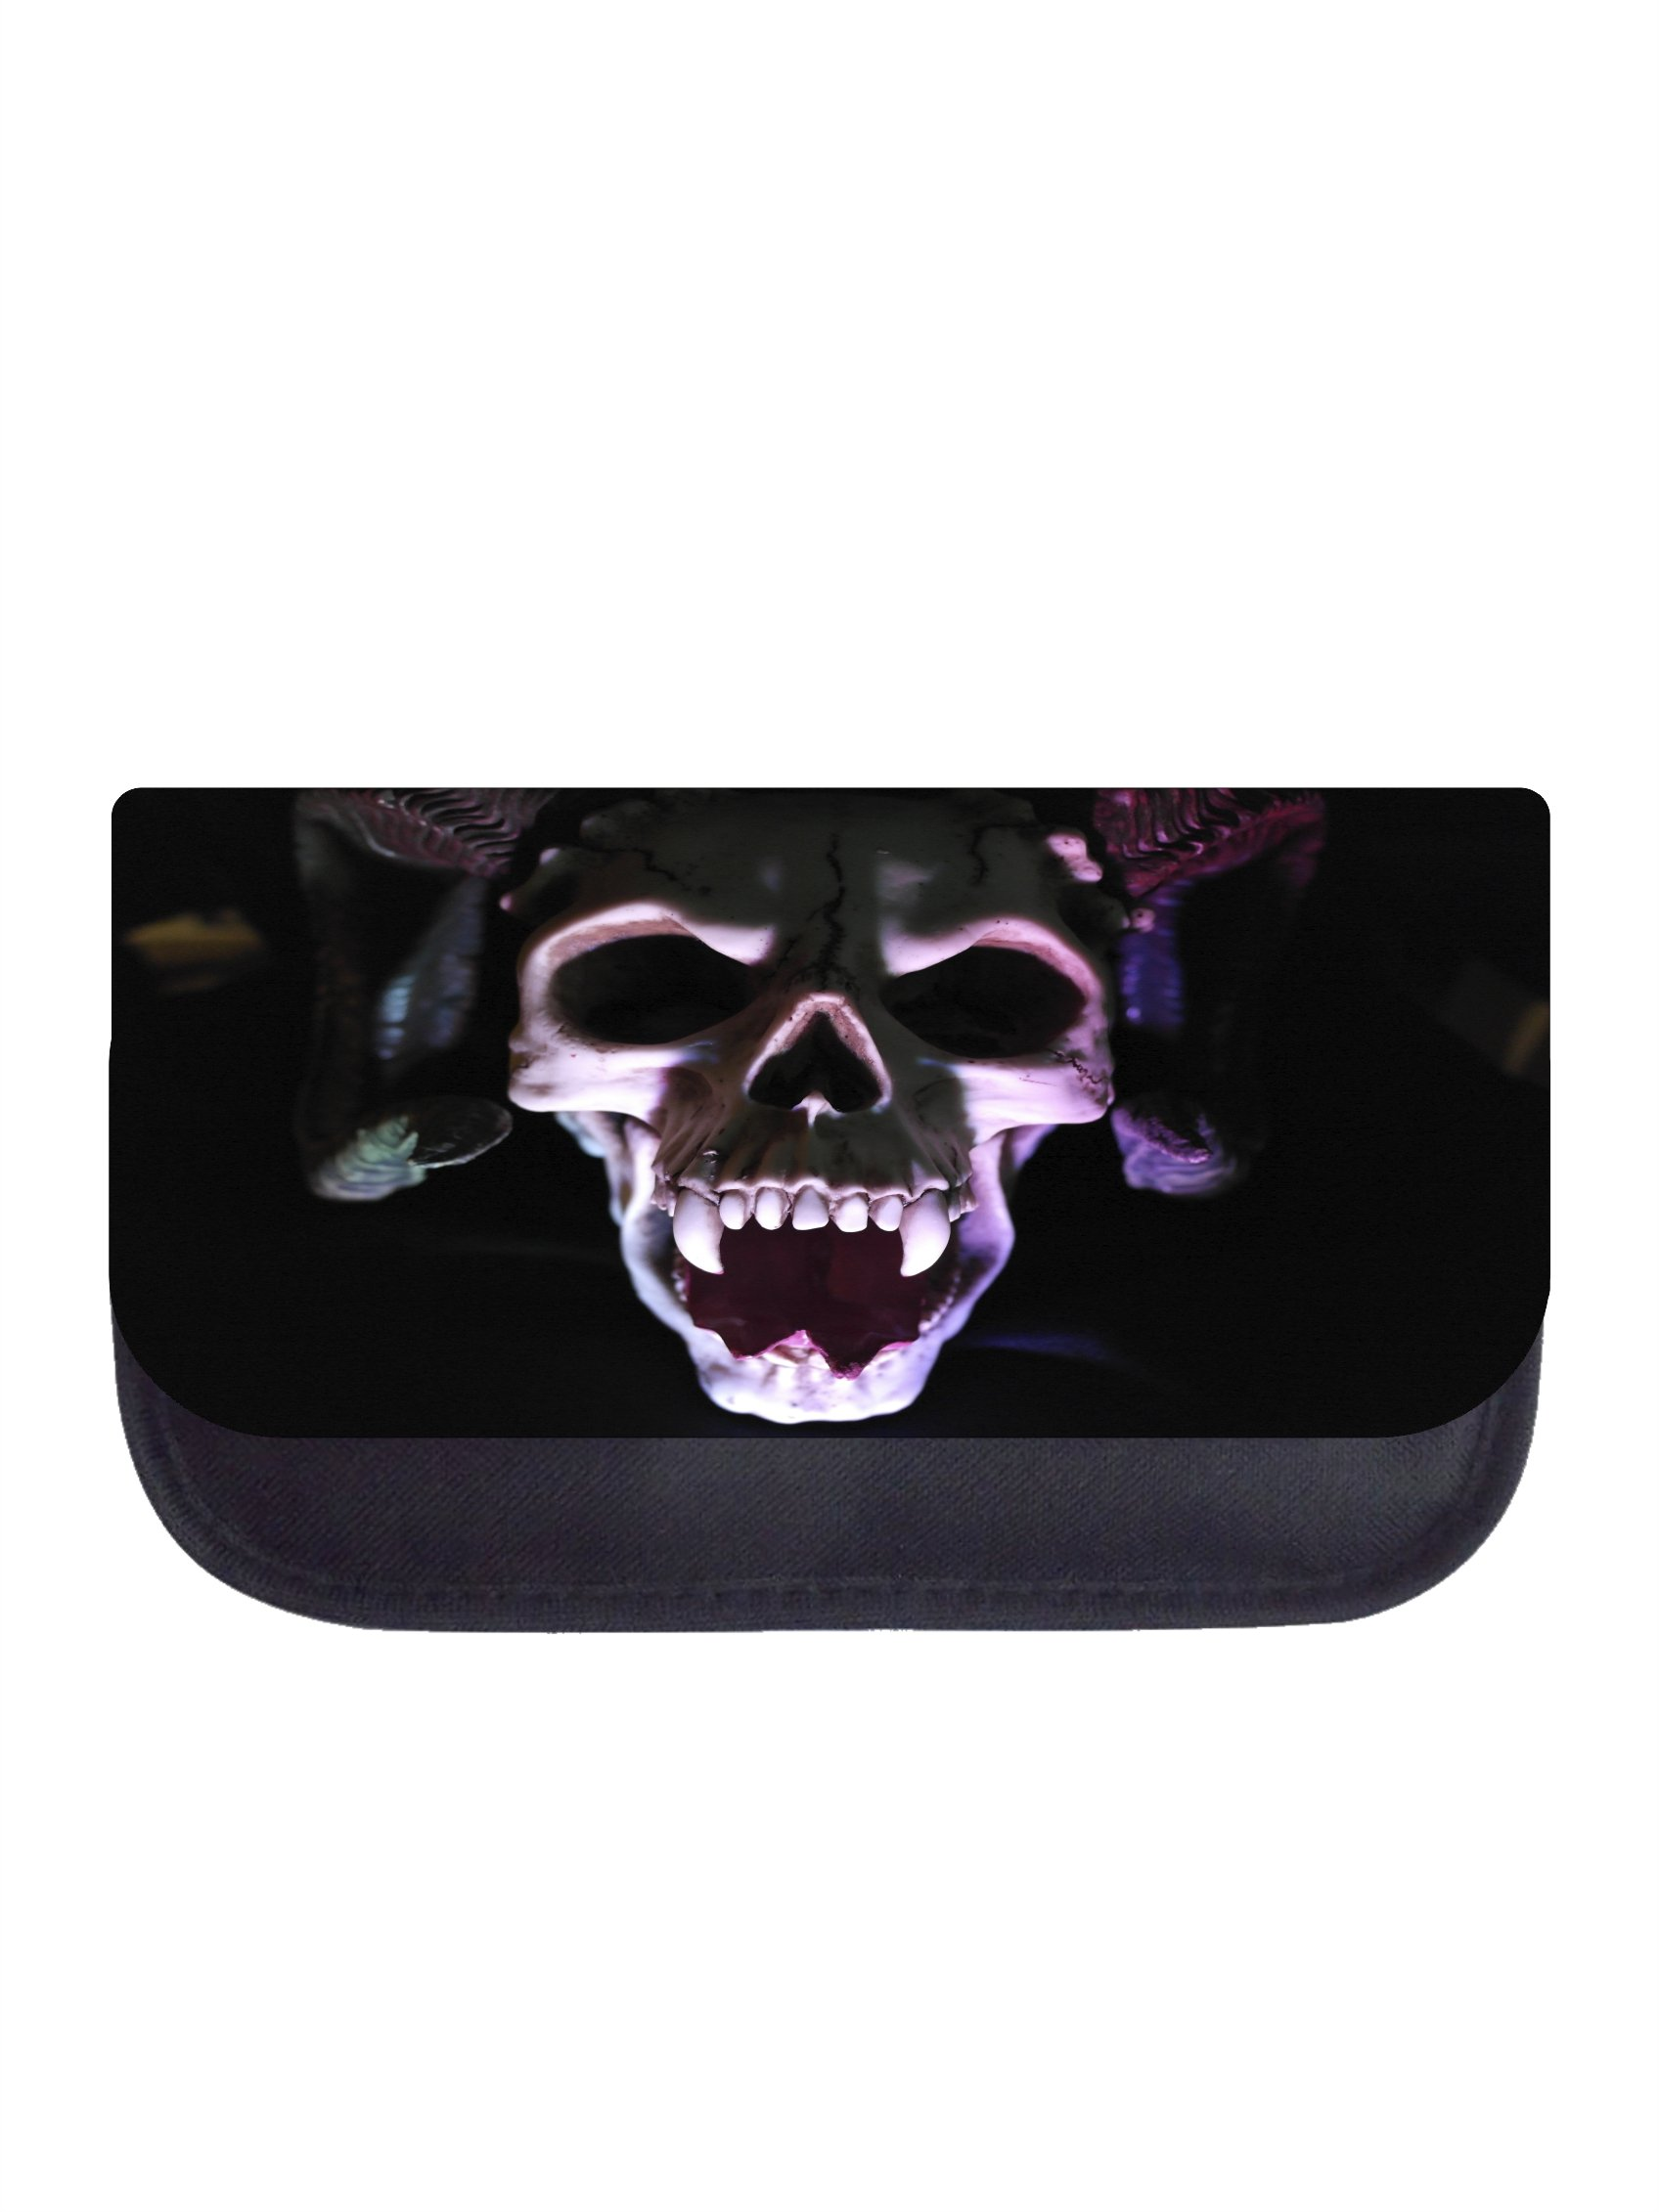 Freaky Fanged Skull - Black Pencil Case - Pencil Bag